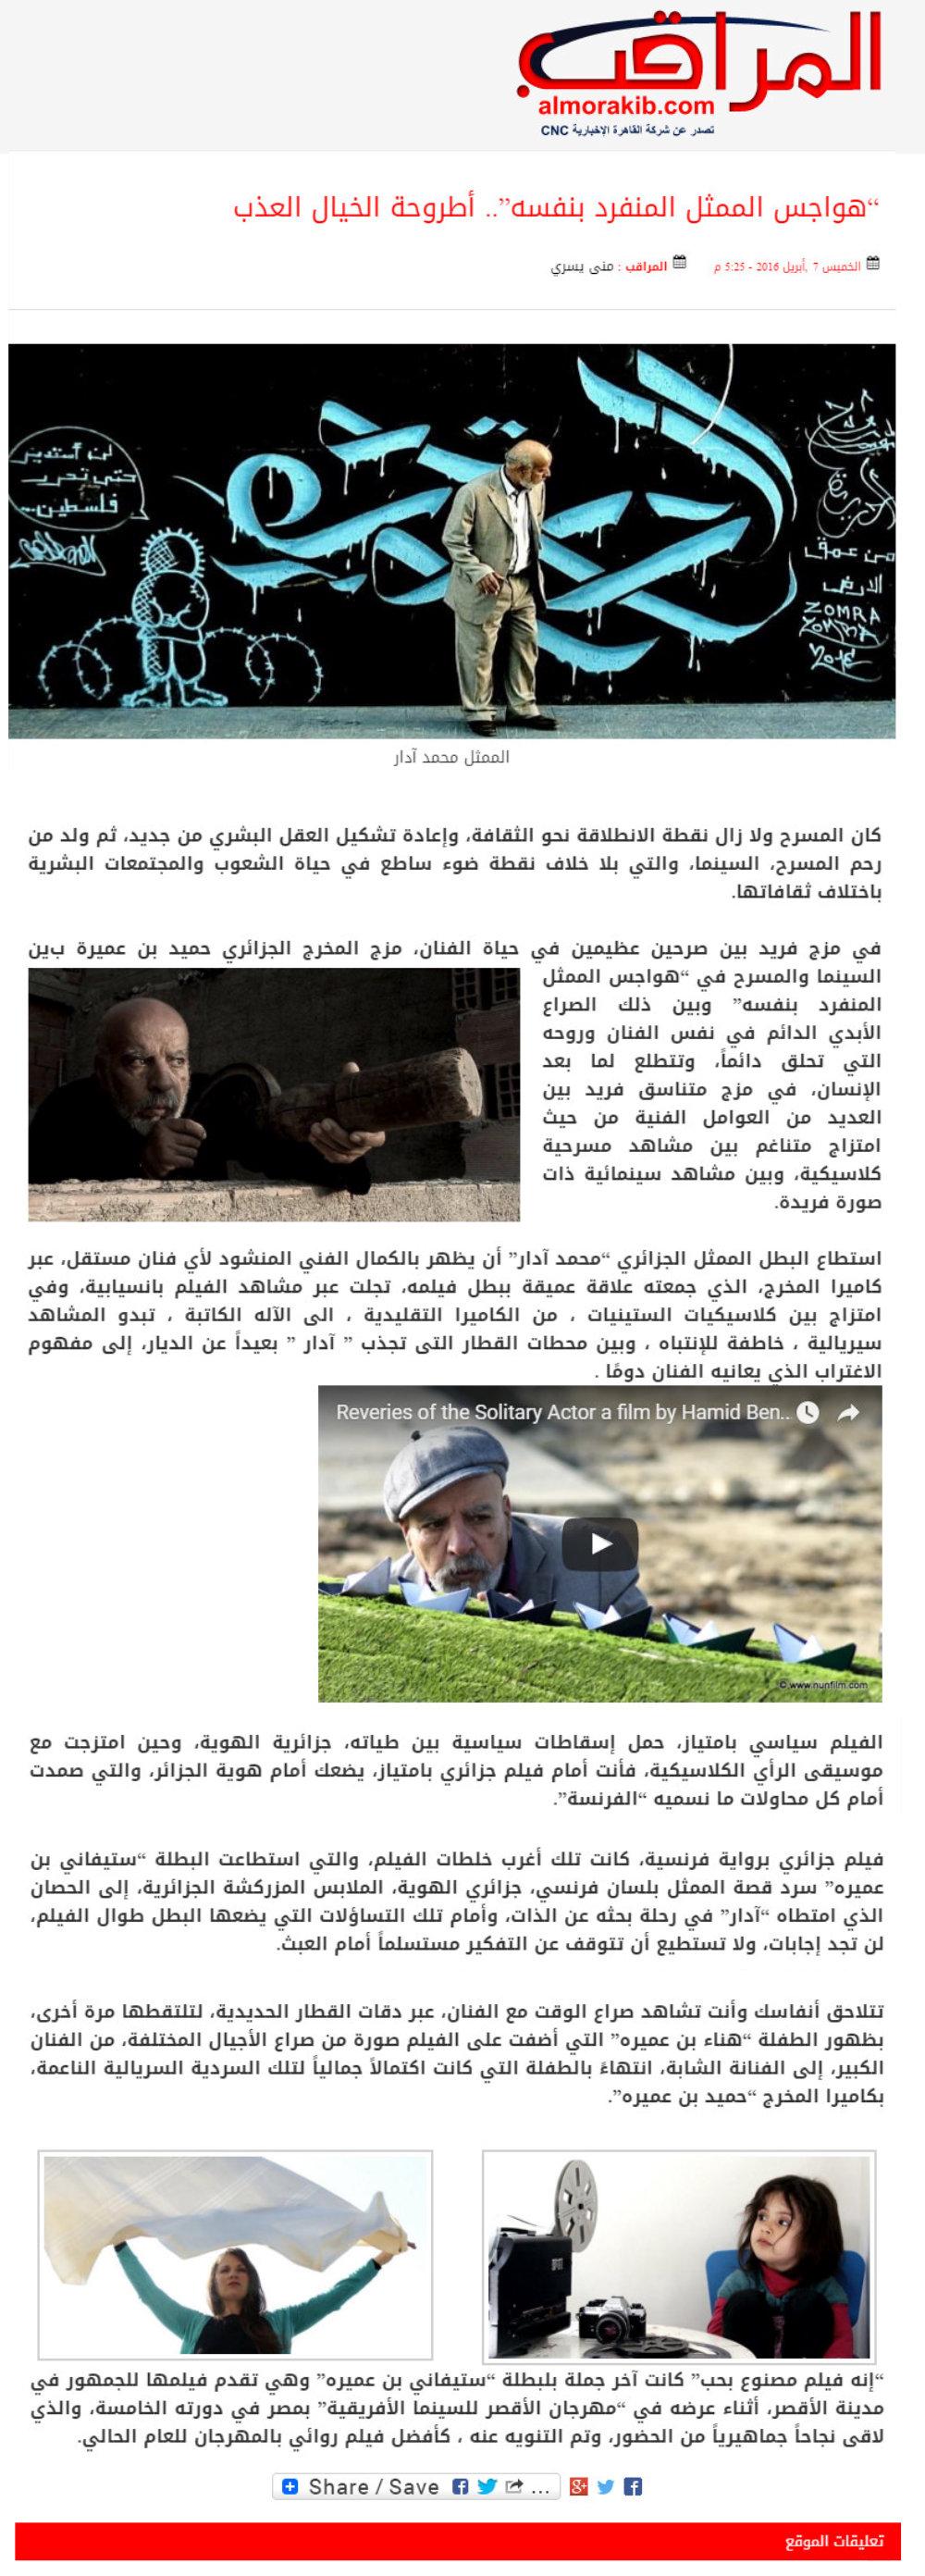 press reveries film hamid benamra